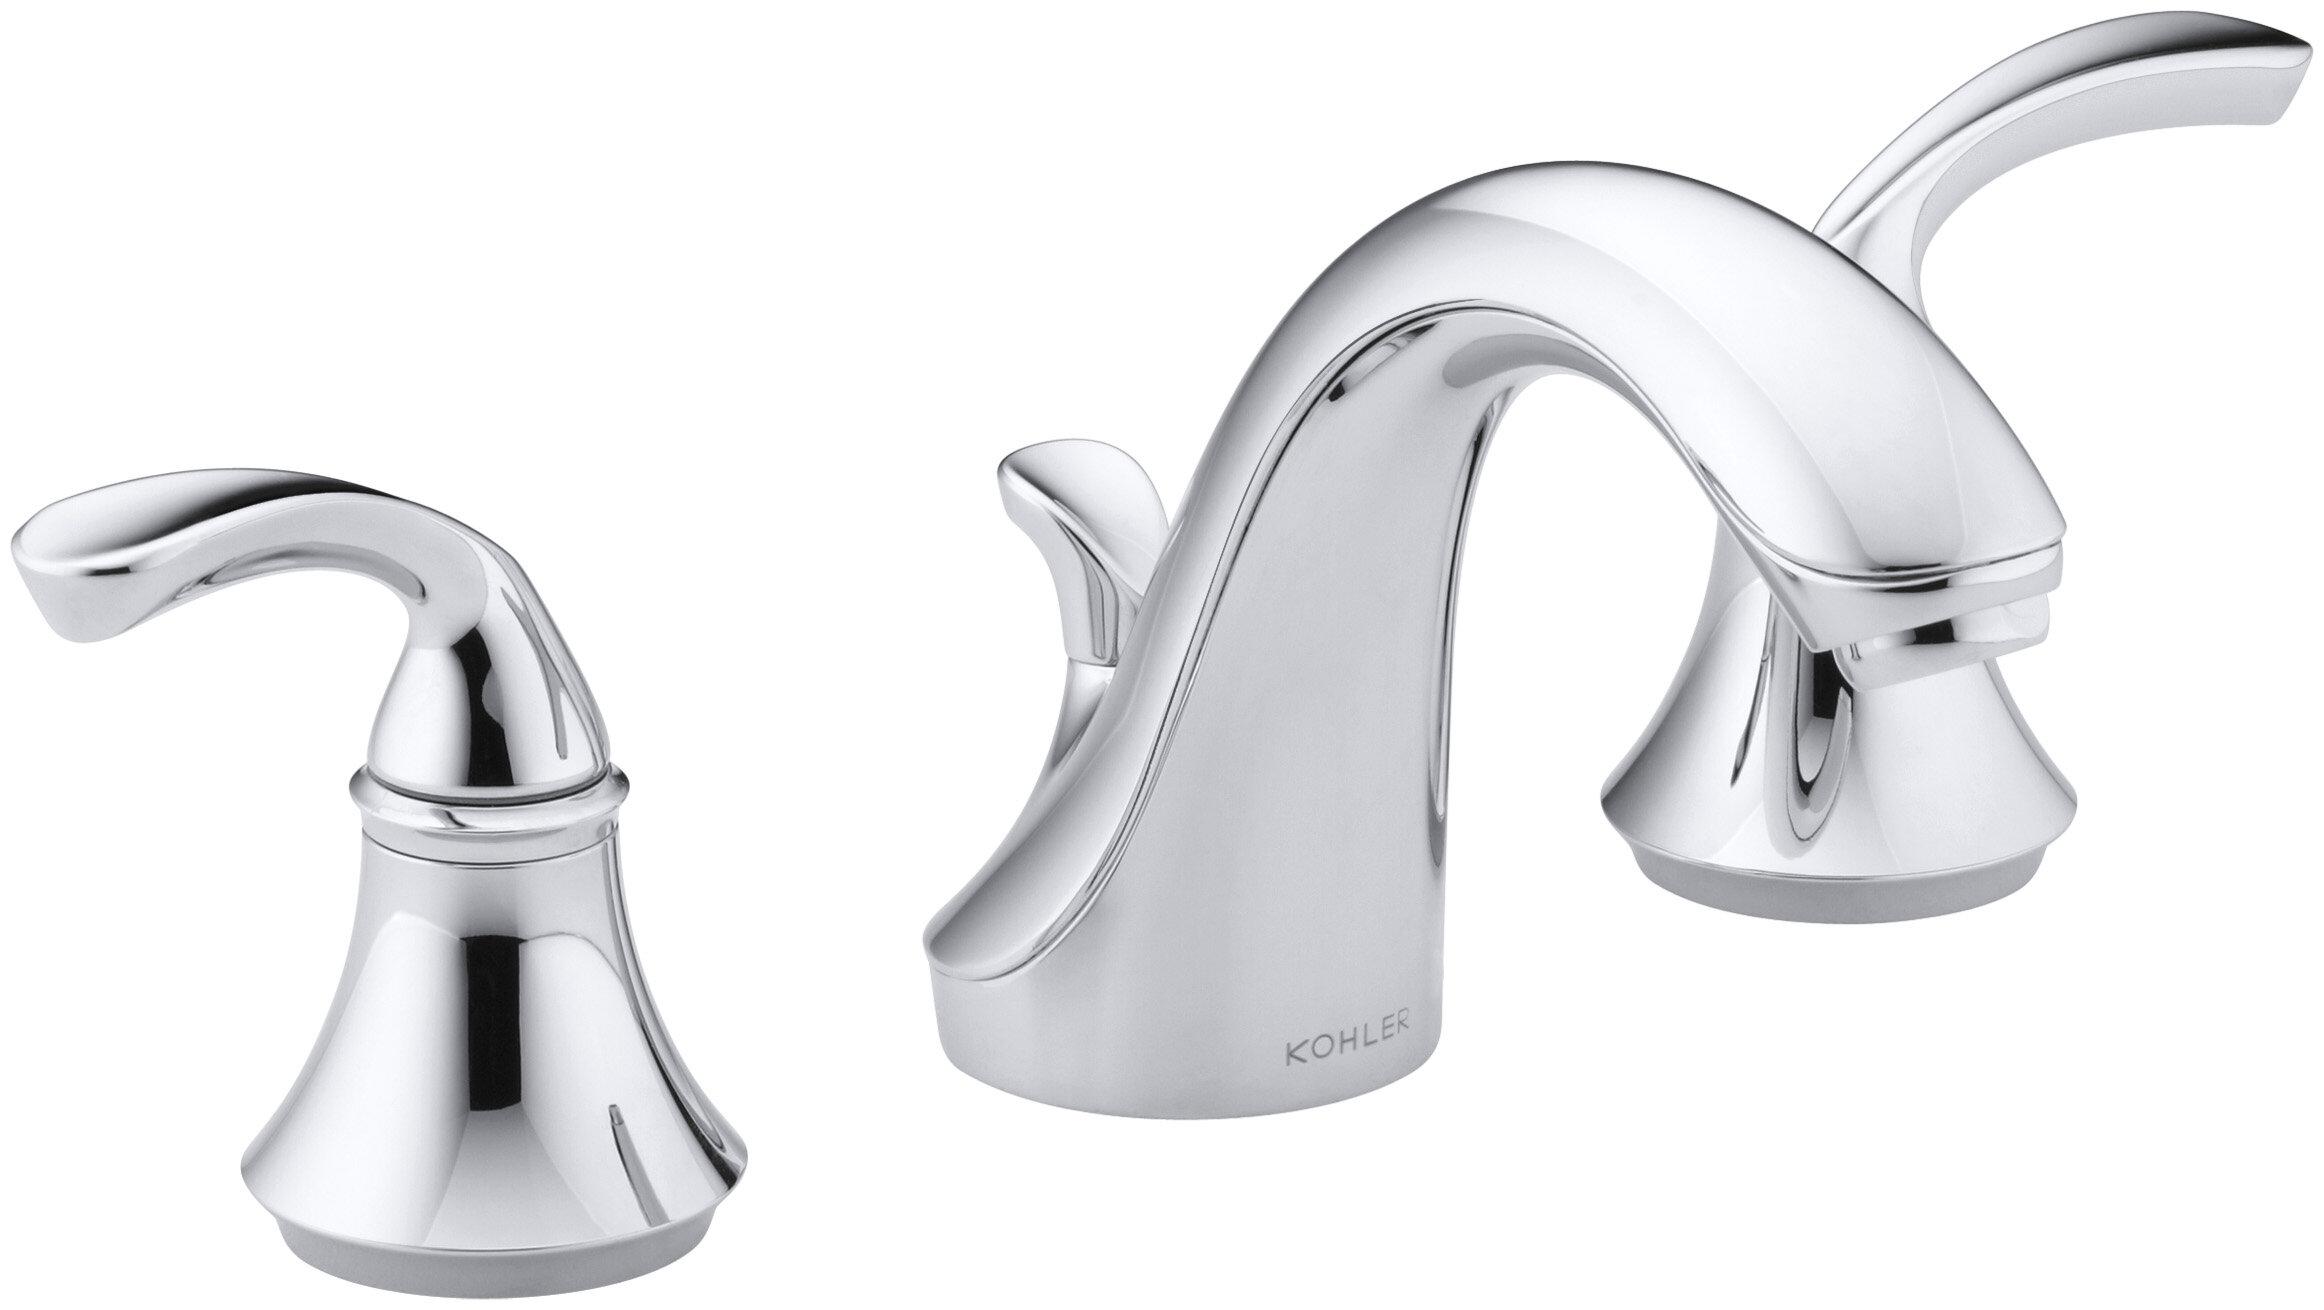 K 10272 4 Bn Cp G Kohler Forté Widespread Bathroom Faucet With Drain Embly Reviews Wayfair